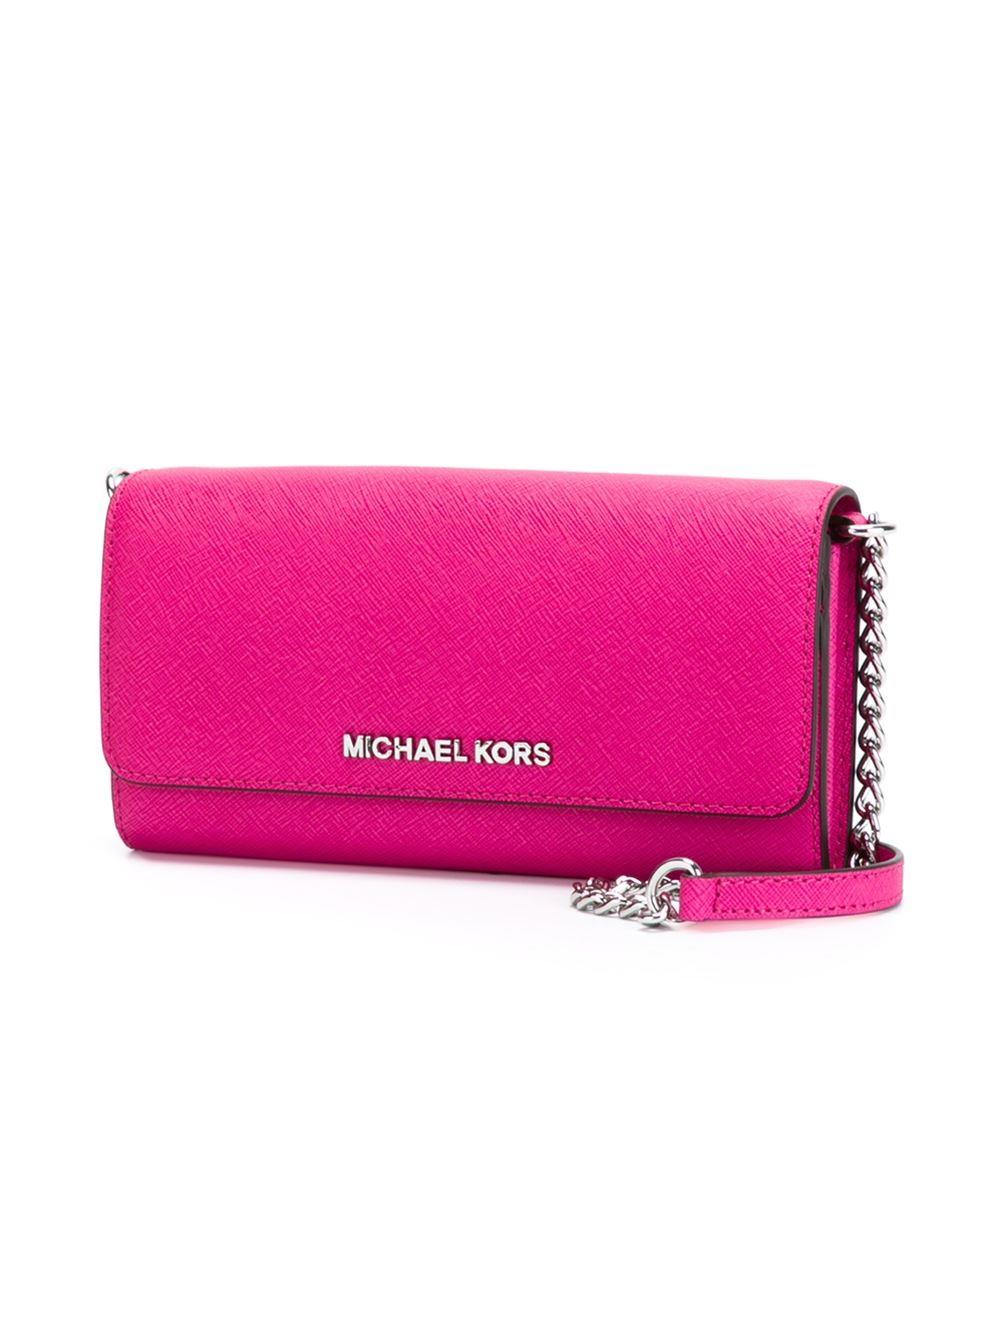 Michael Michael Kors Jet Set Travel Wallet Crossbody Bag